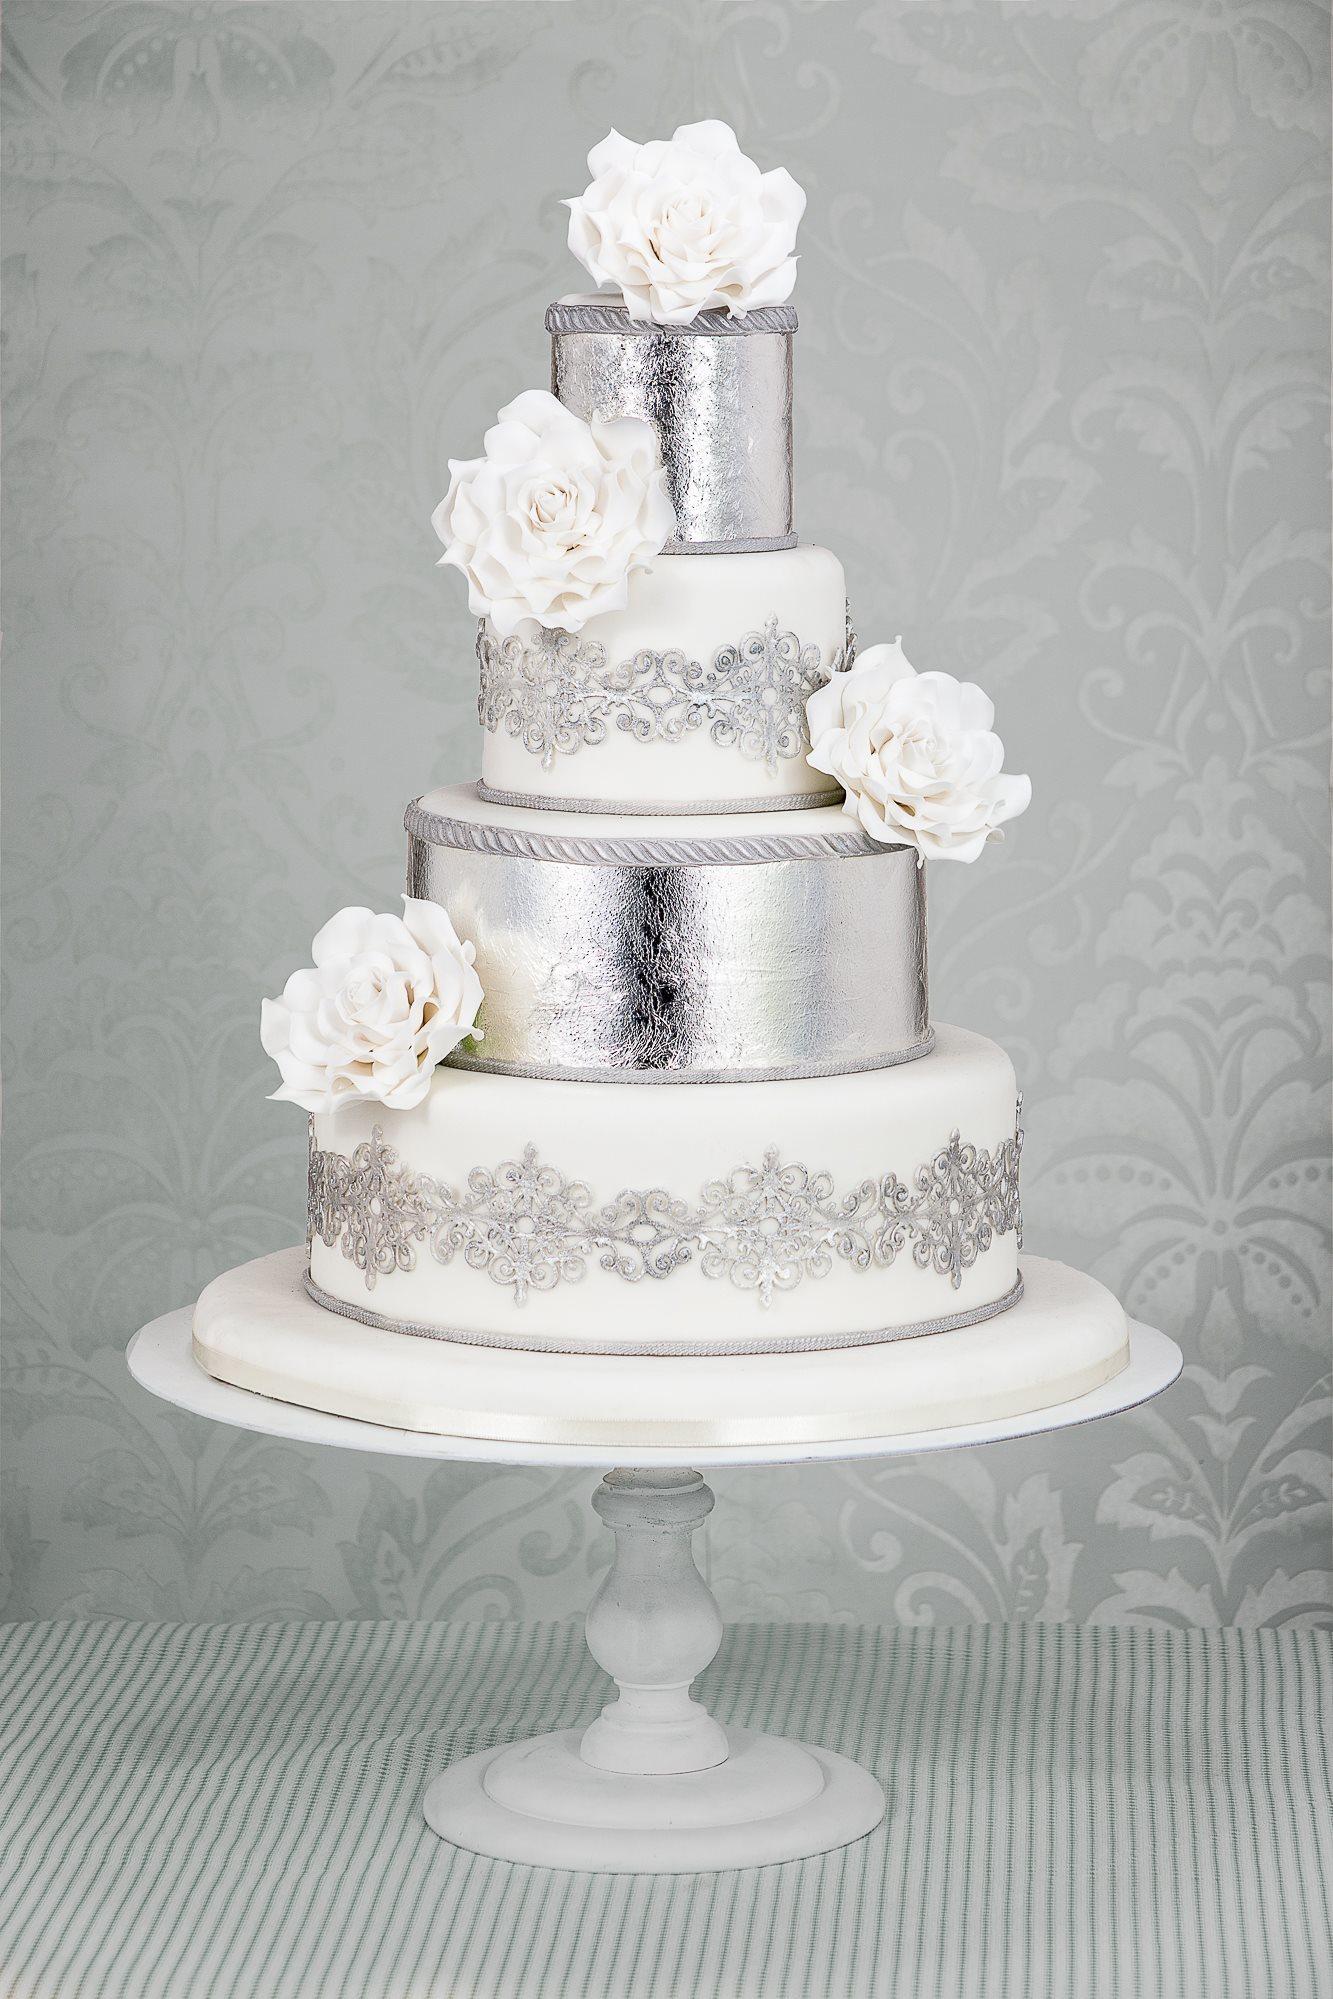 White & Silver fondant Wedding cake